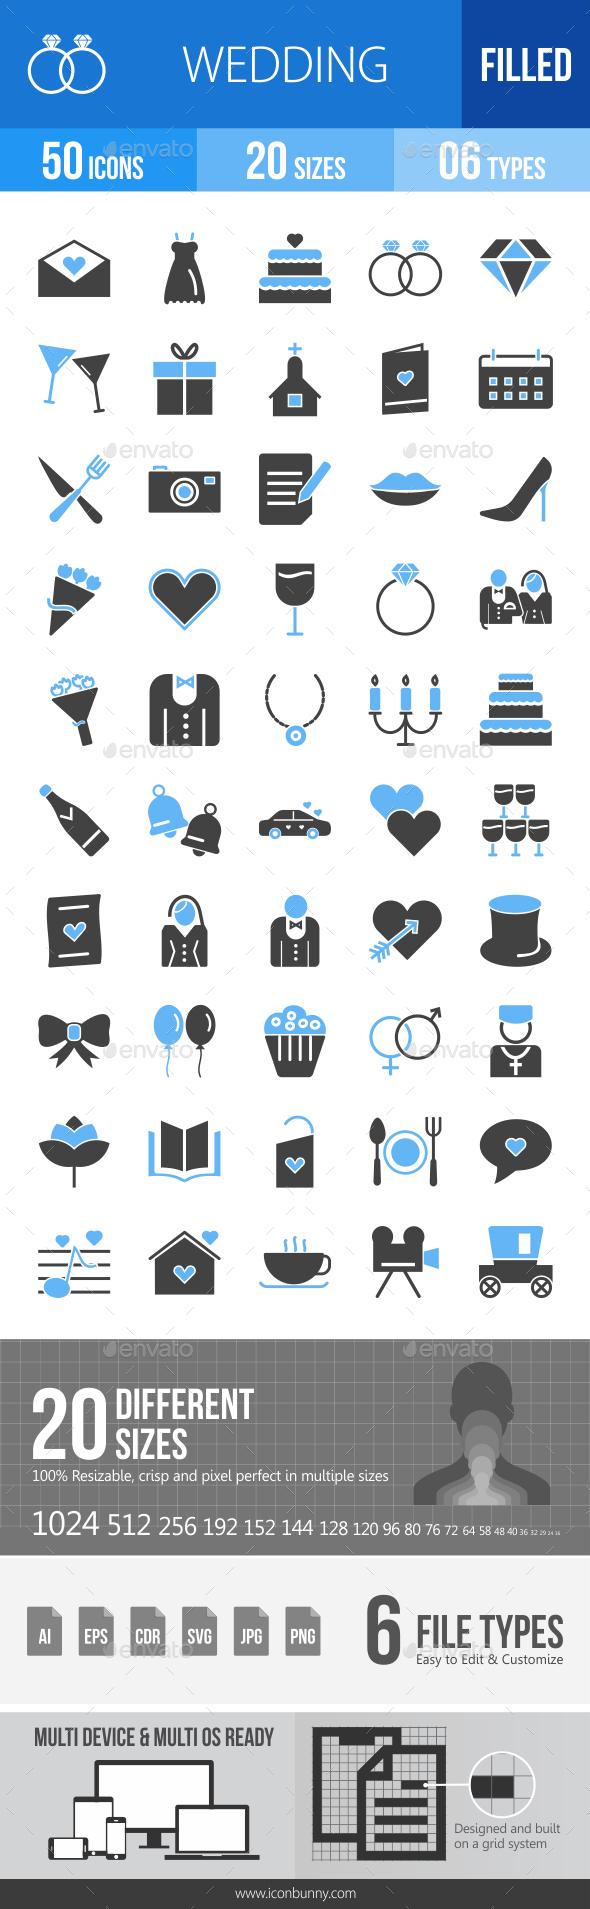 50 Wedding Filled Blue & Black Icons - Icons